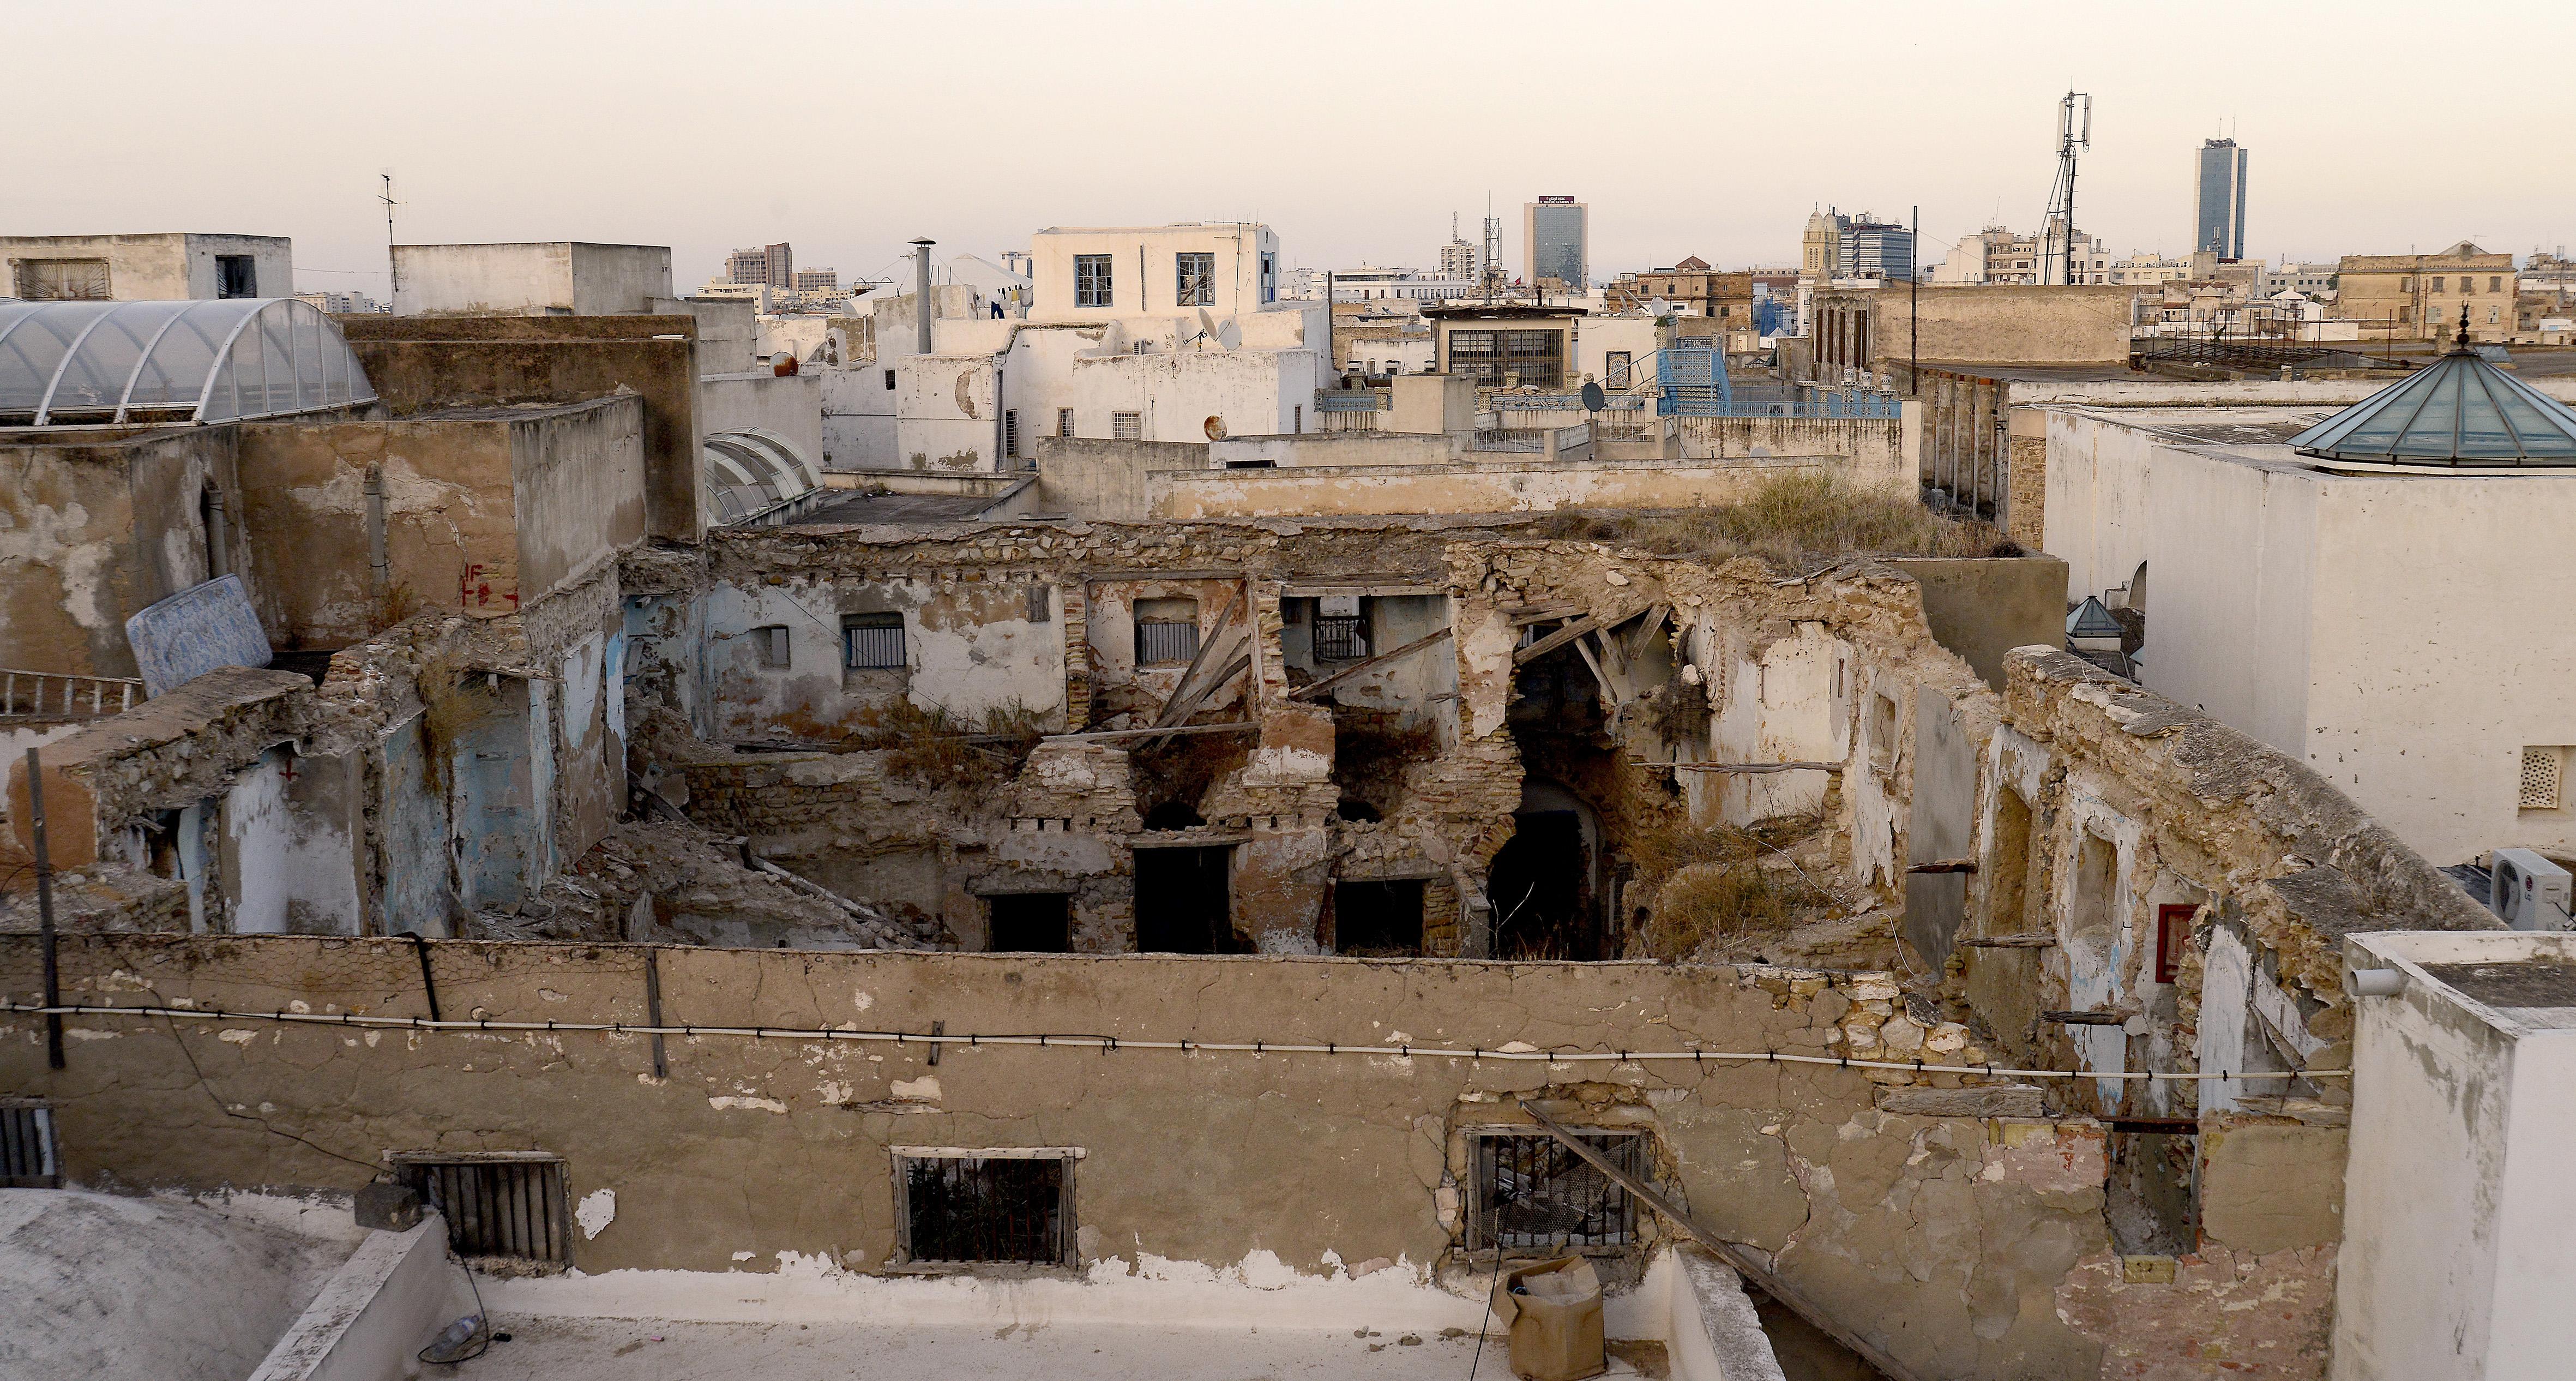 Tunisian jihadism five years after Ansar al-Sharia